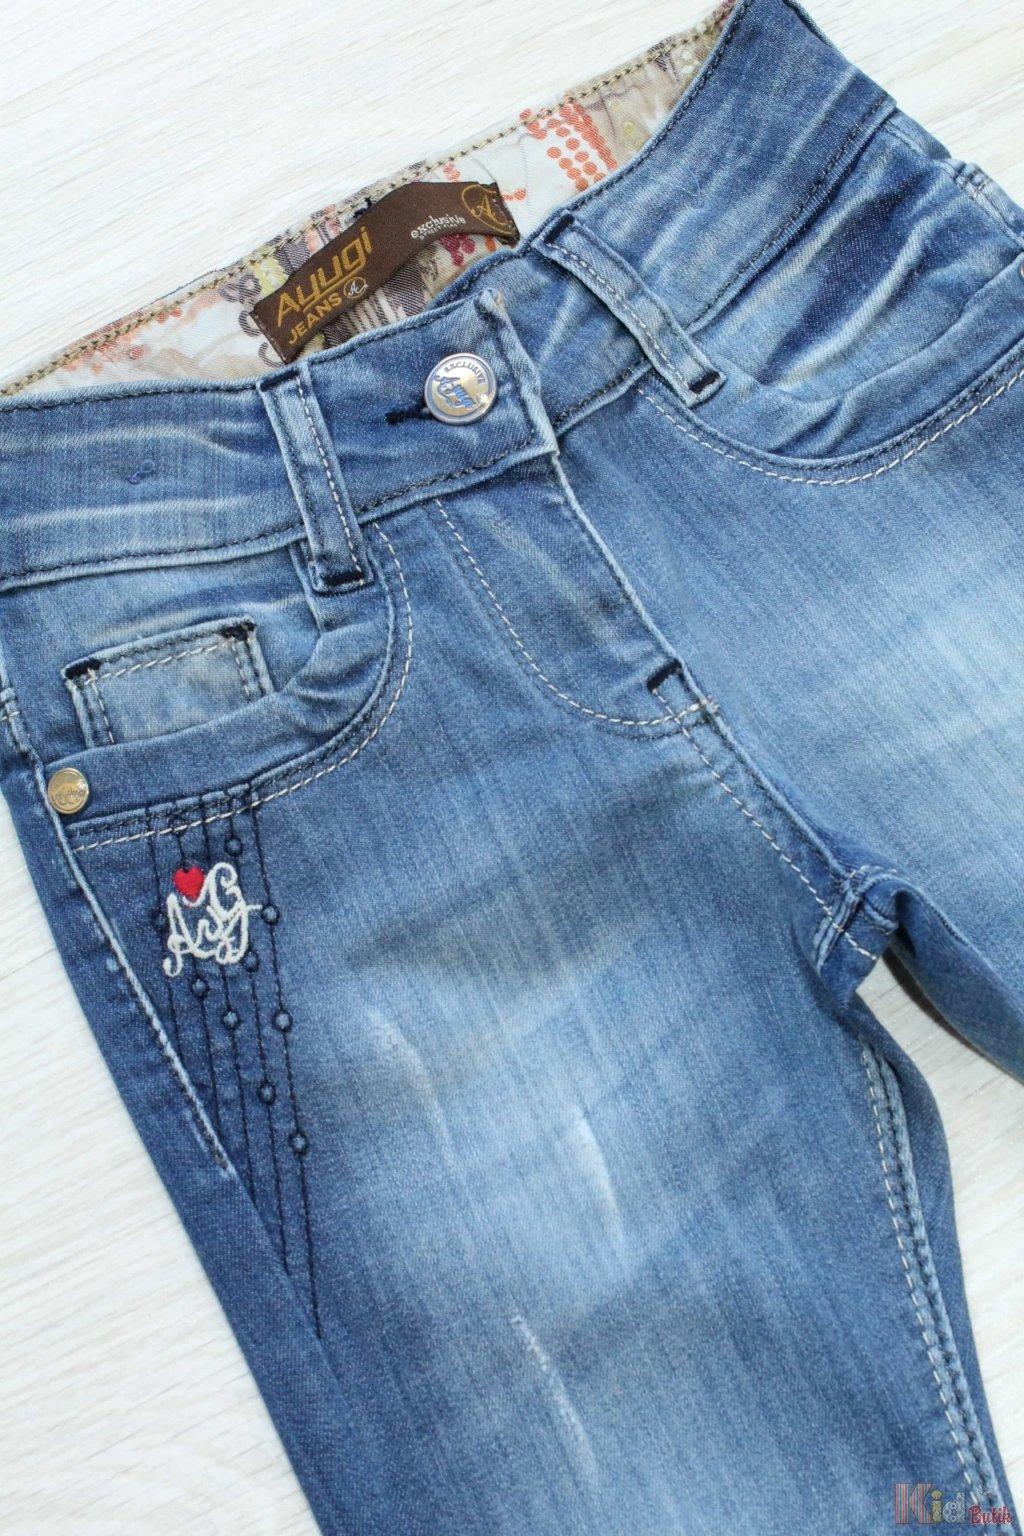 Джинсы с вышивкой на кармане 32